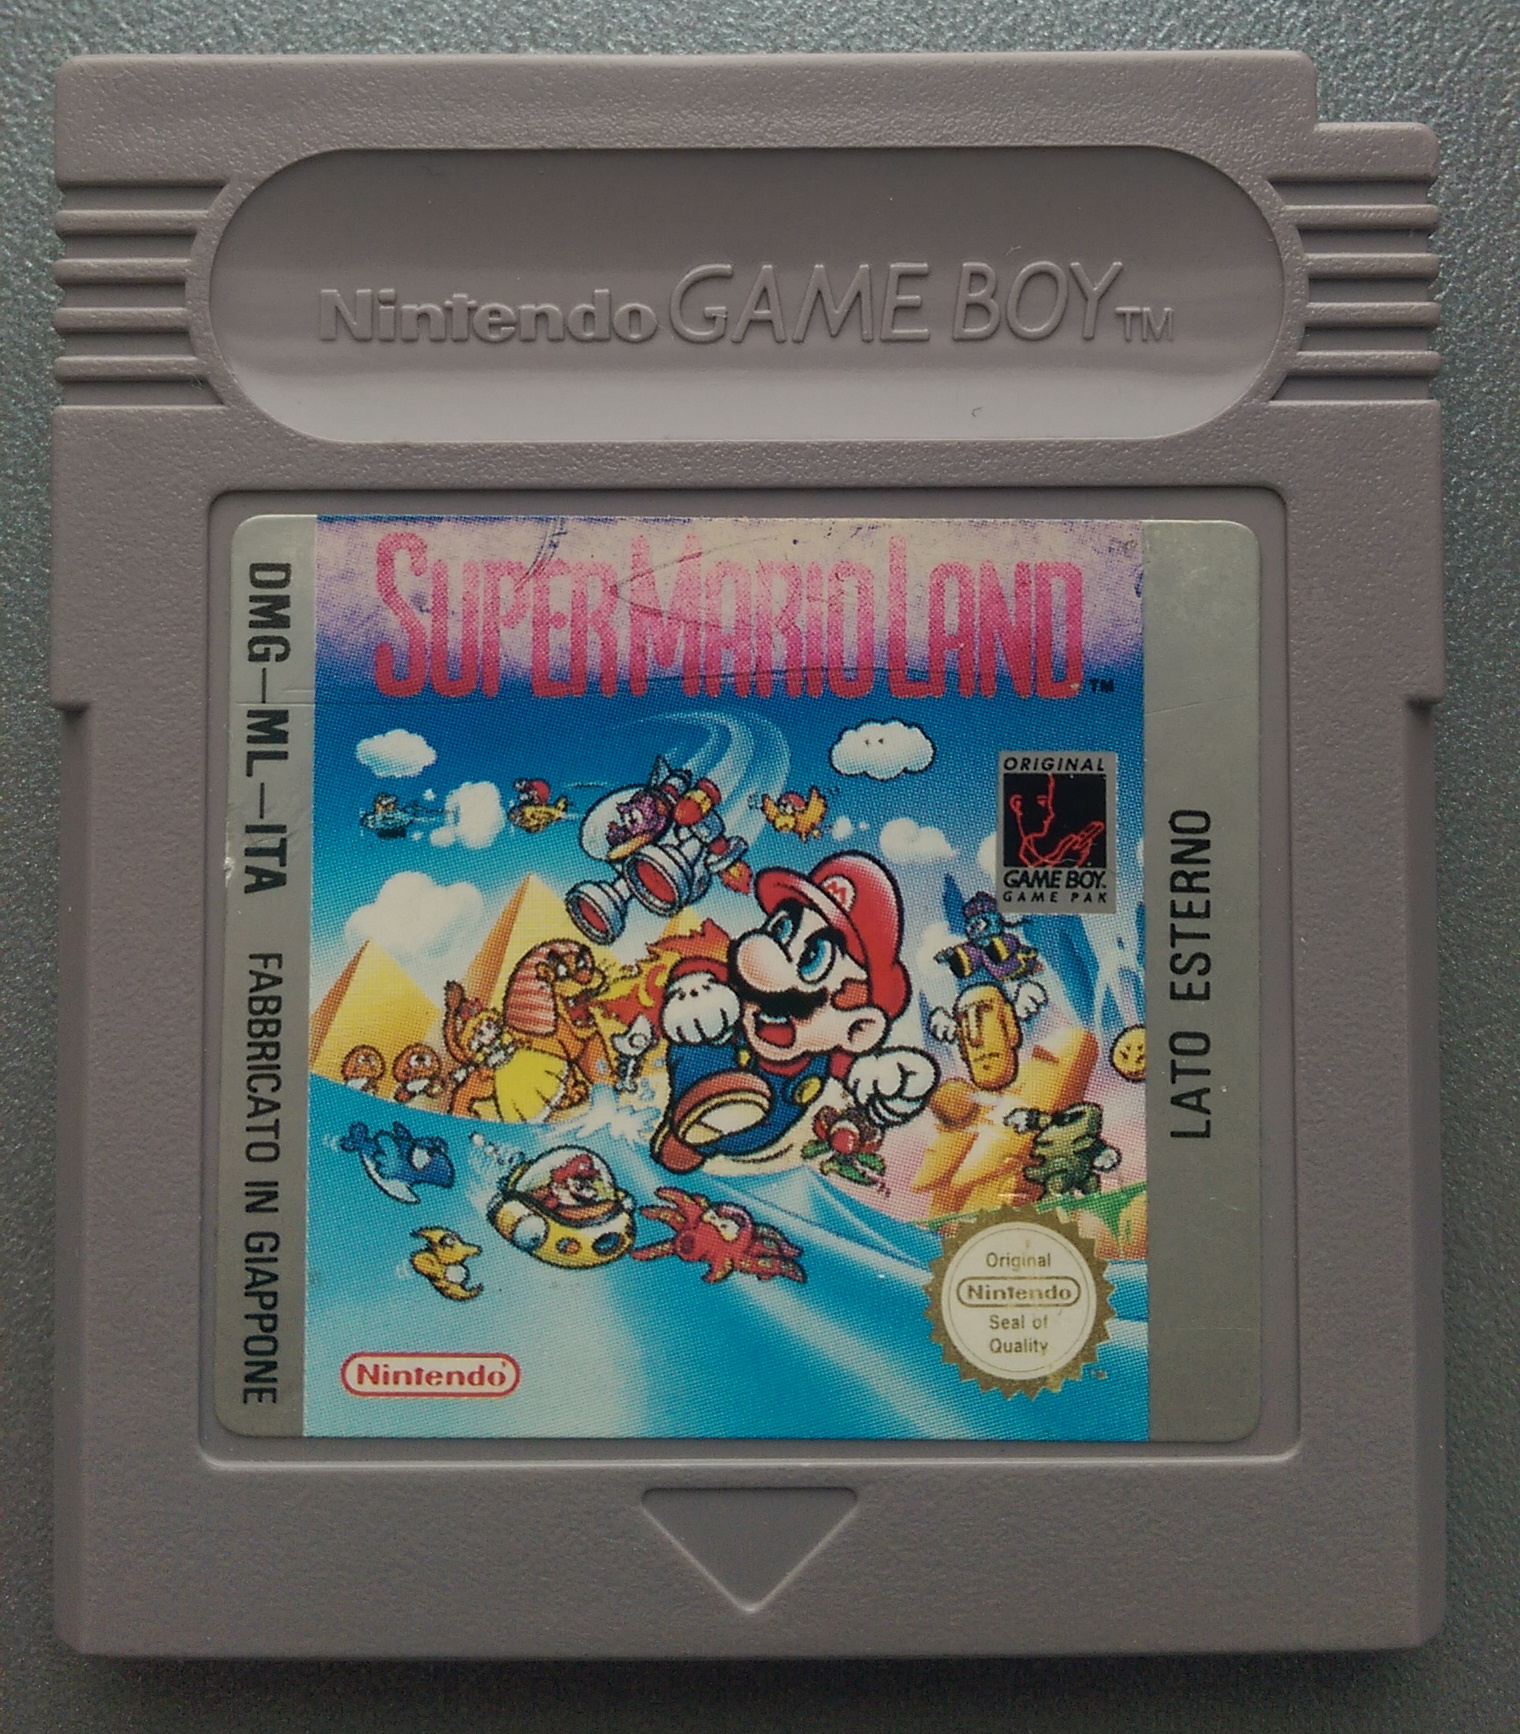 Super Mario Land (World) (Rev 1) - Game Boy hardware database